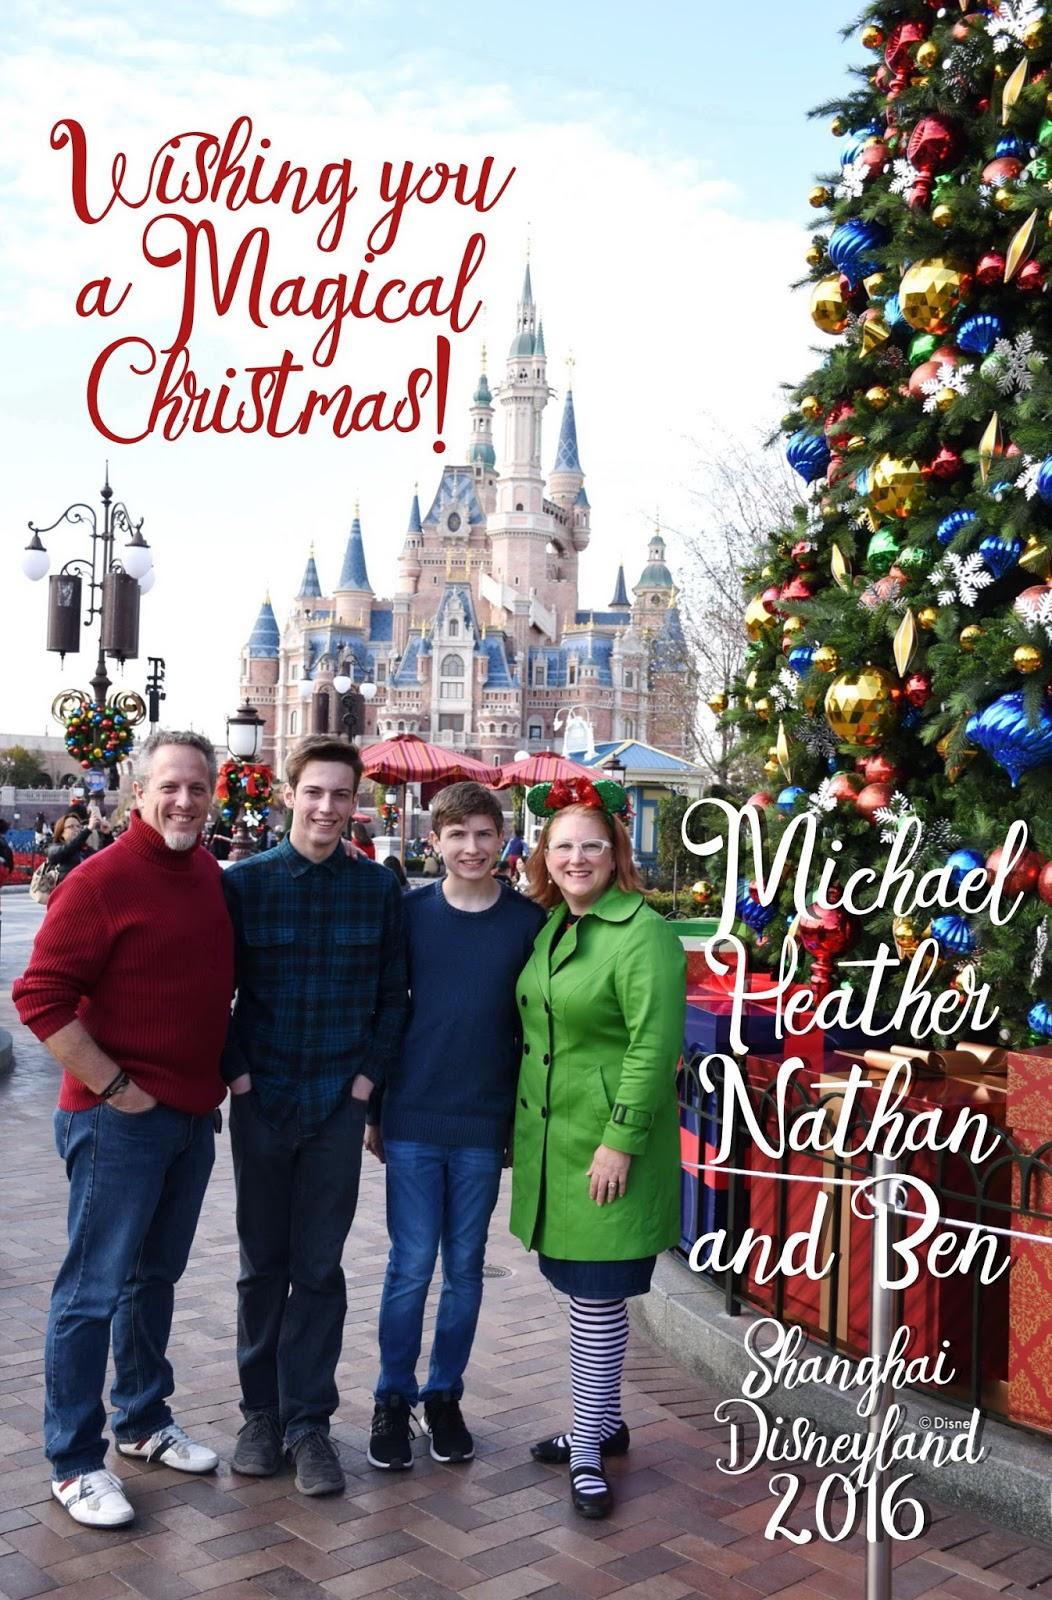 My Wandering Life Merry Christmas From Shanghai Disneyland